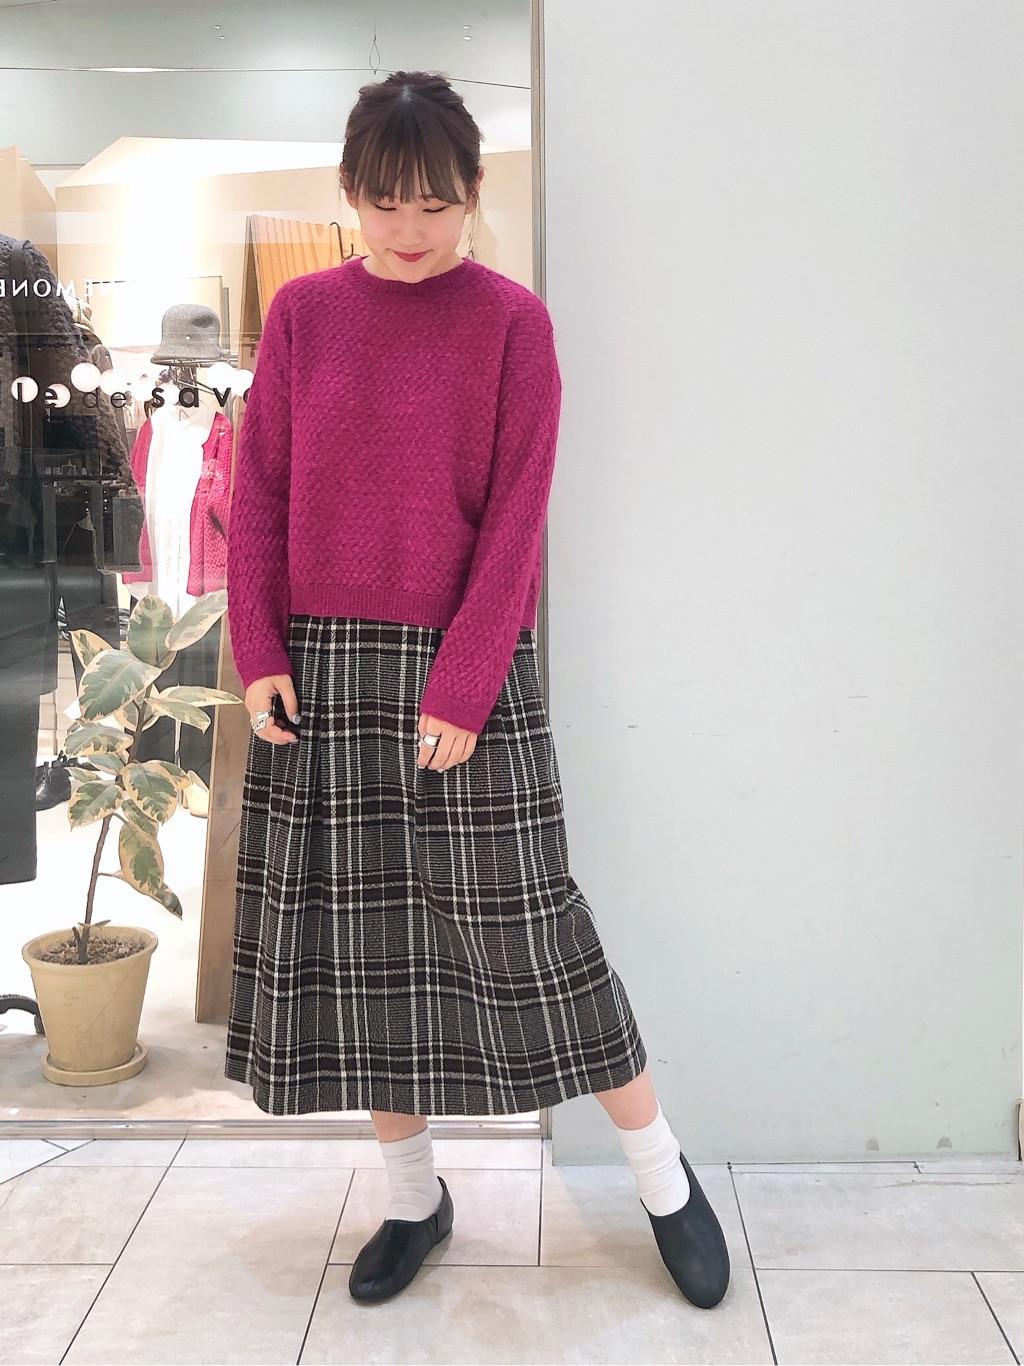 bulle de savon 阪急西宮ガーデンズ 身長:166cm 2019.11.12